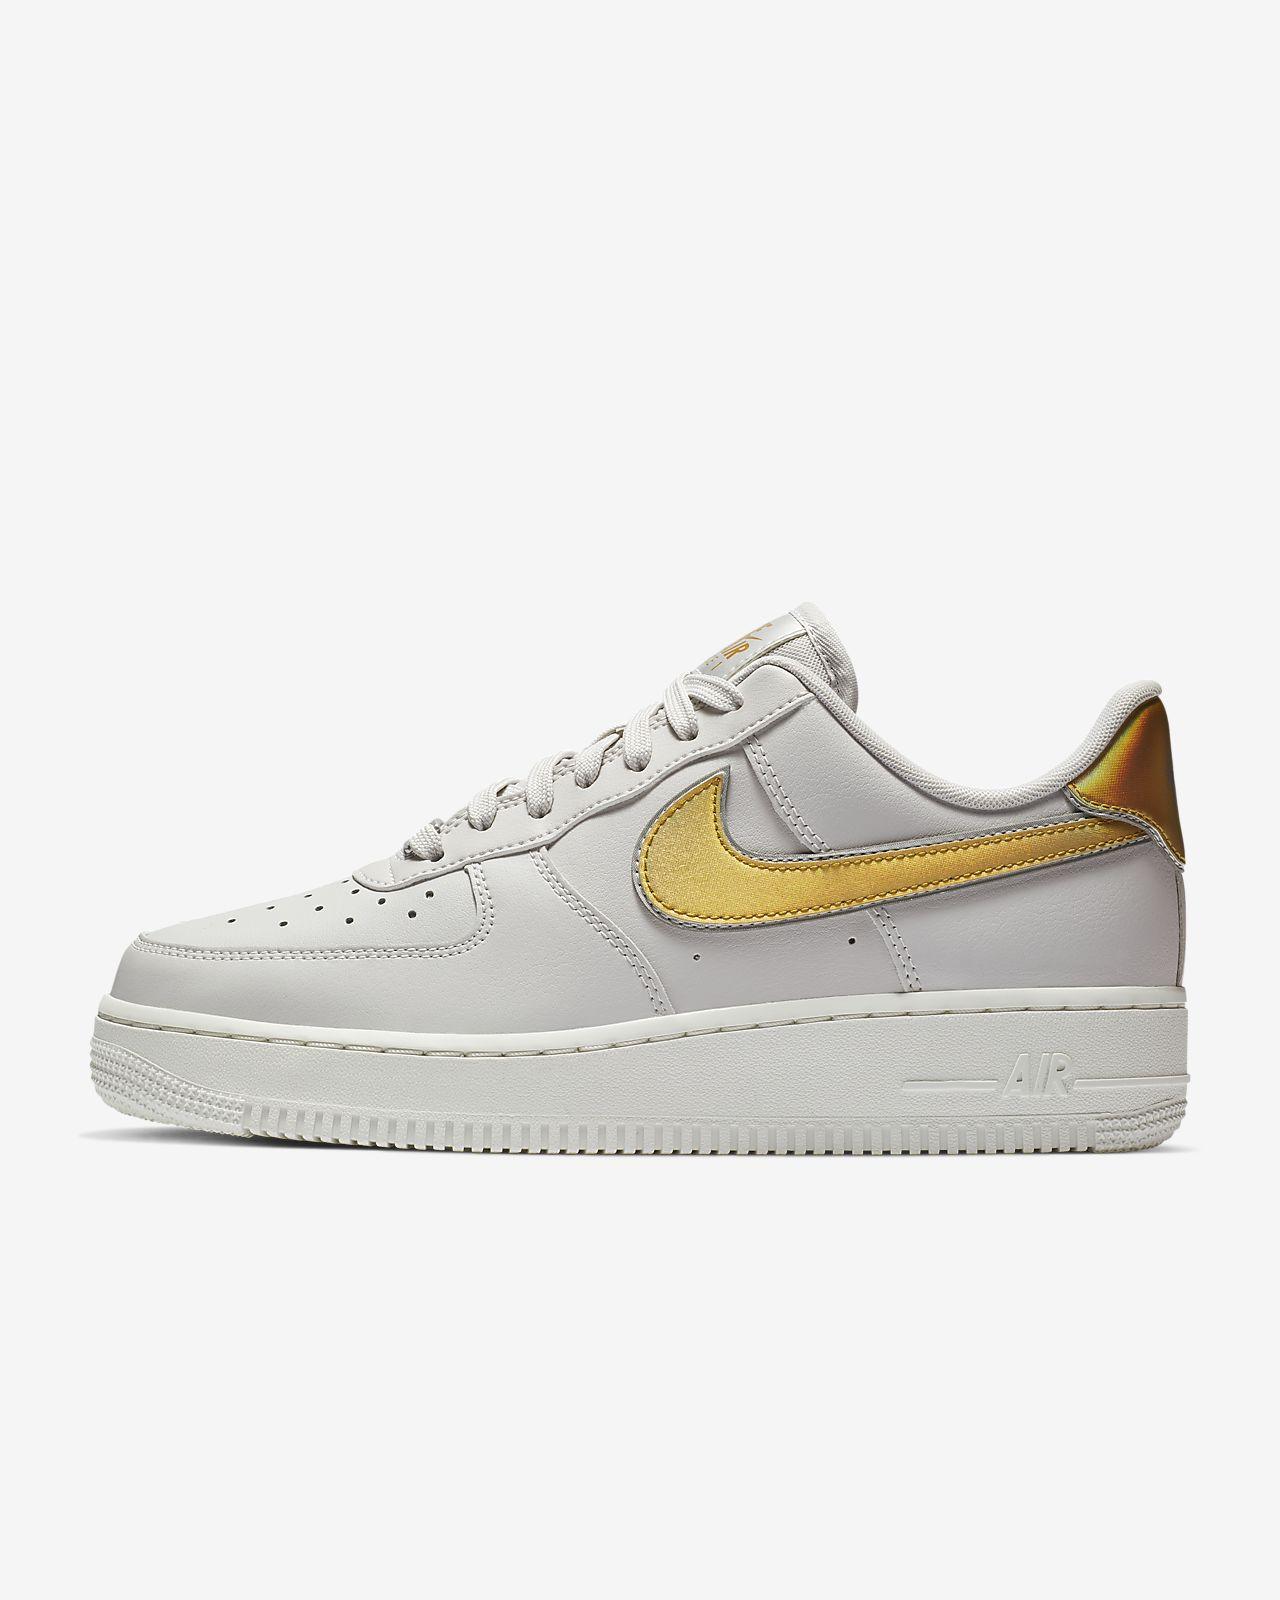 0aab3f5fa810a ... usa calzado para mujer nike air force 1 07 metallic 304c7 bc5ed